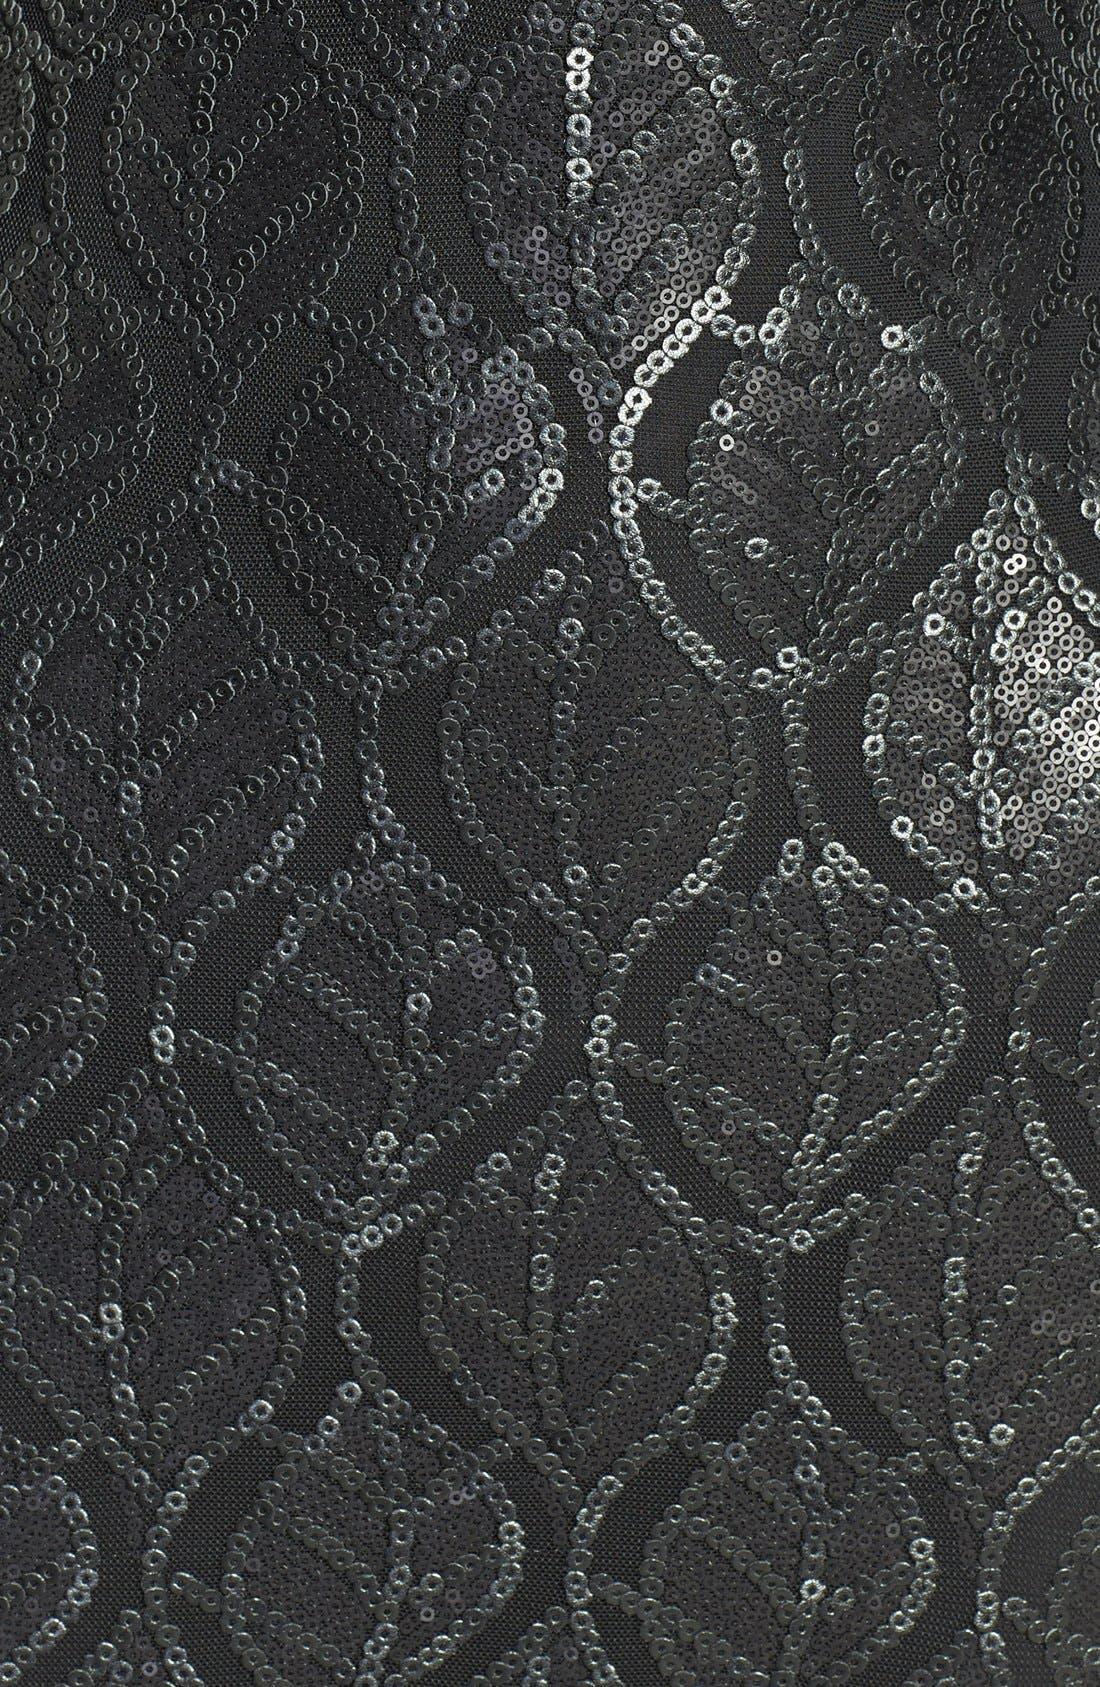 Alternate Image 4  - Dress the Population 'Jaden' Faux Leather Sequin Body-Con Dress